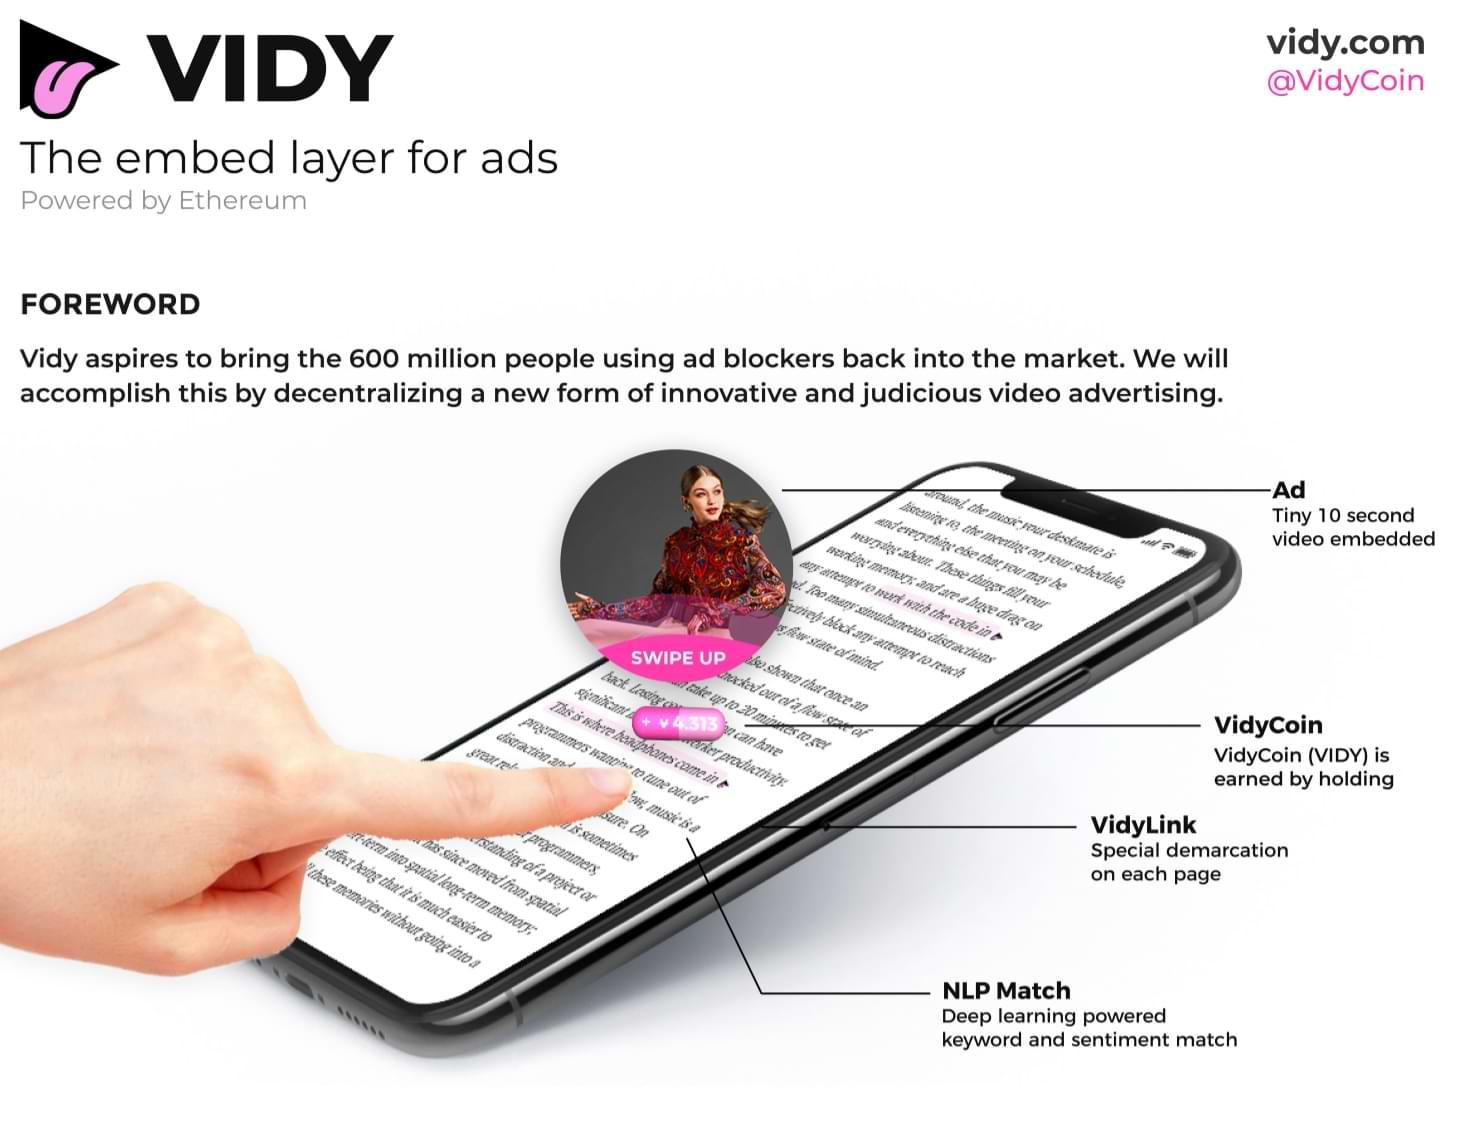 Tentang Vidy - Rechain Digital Indonesia